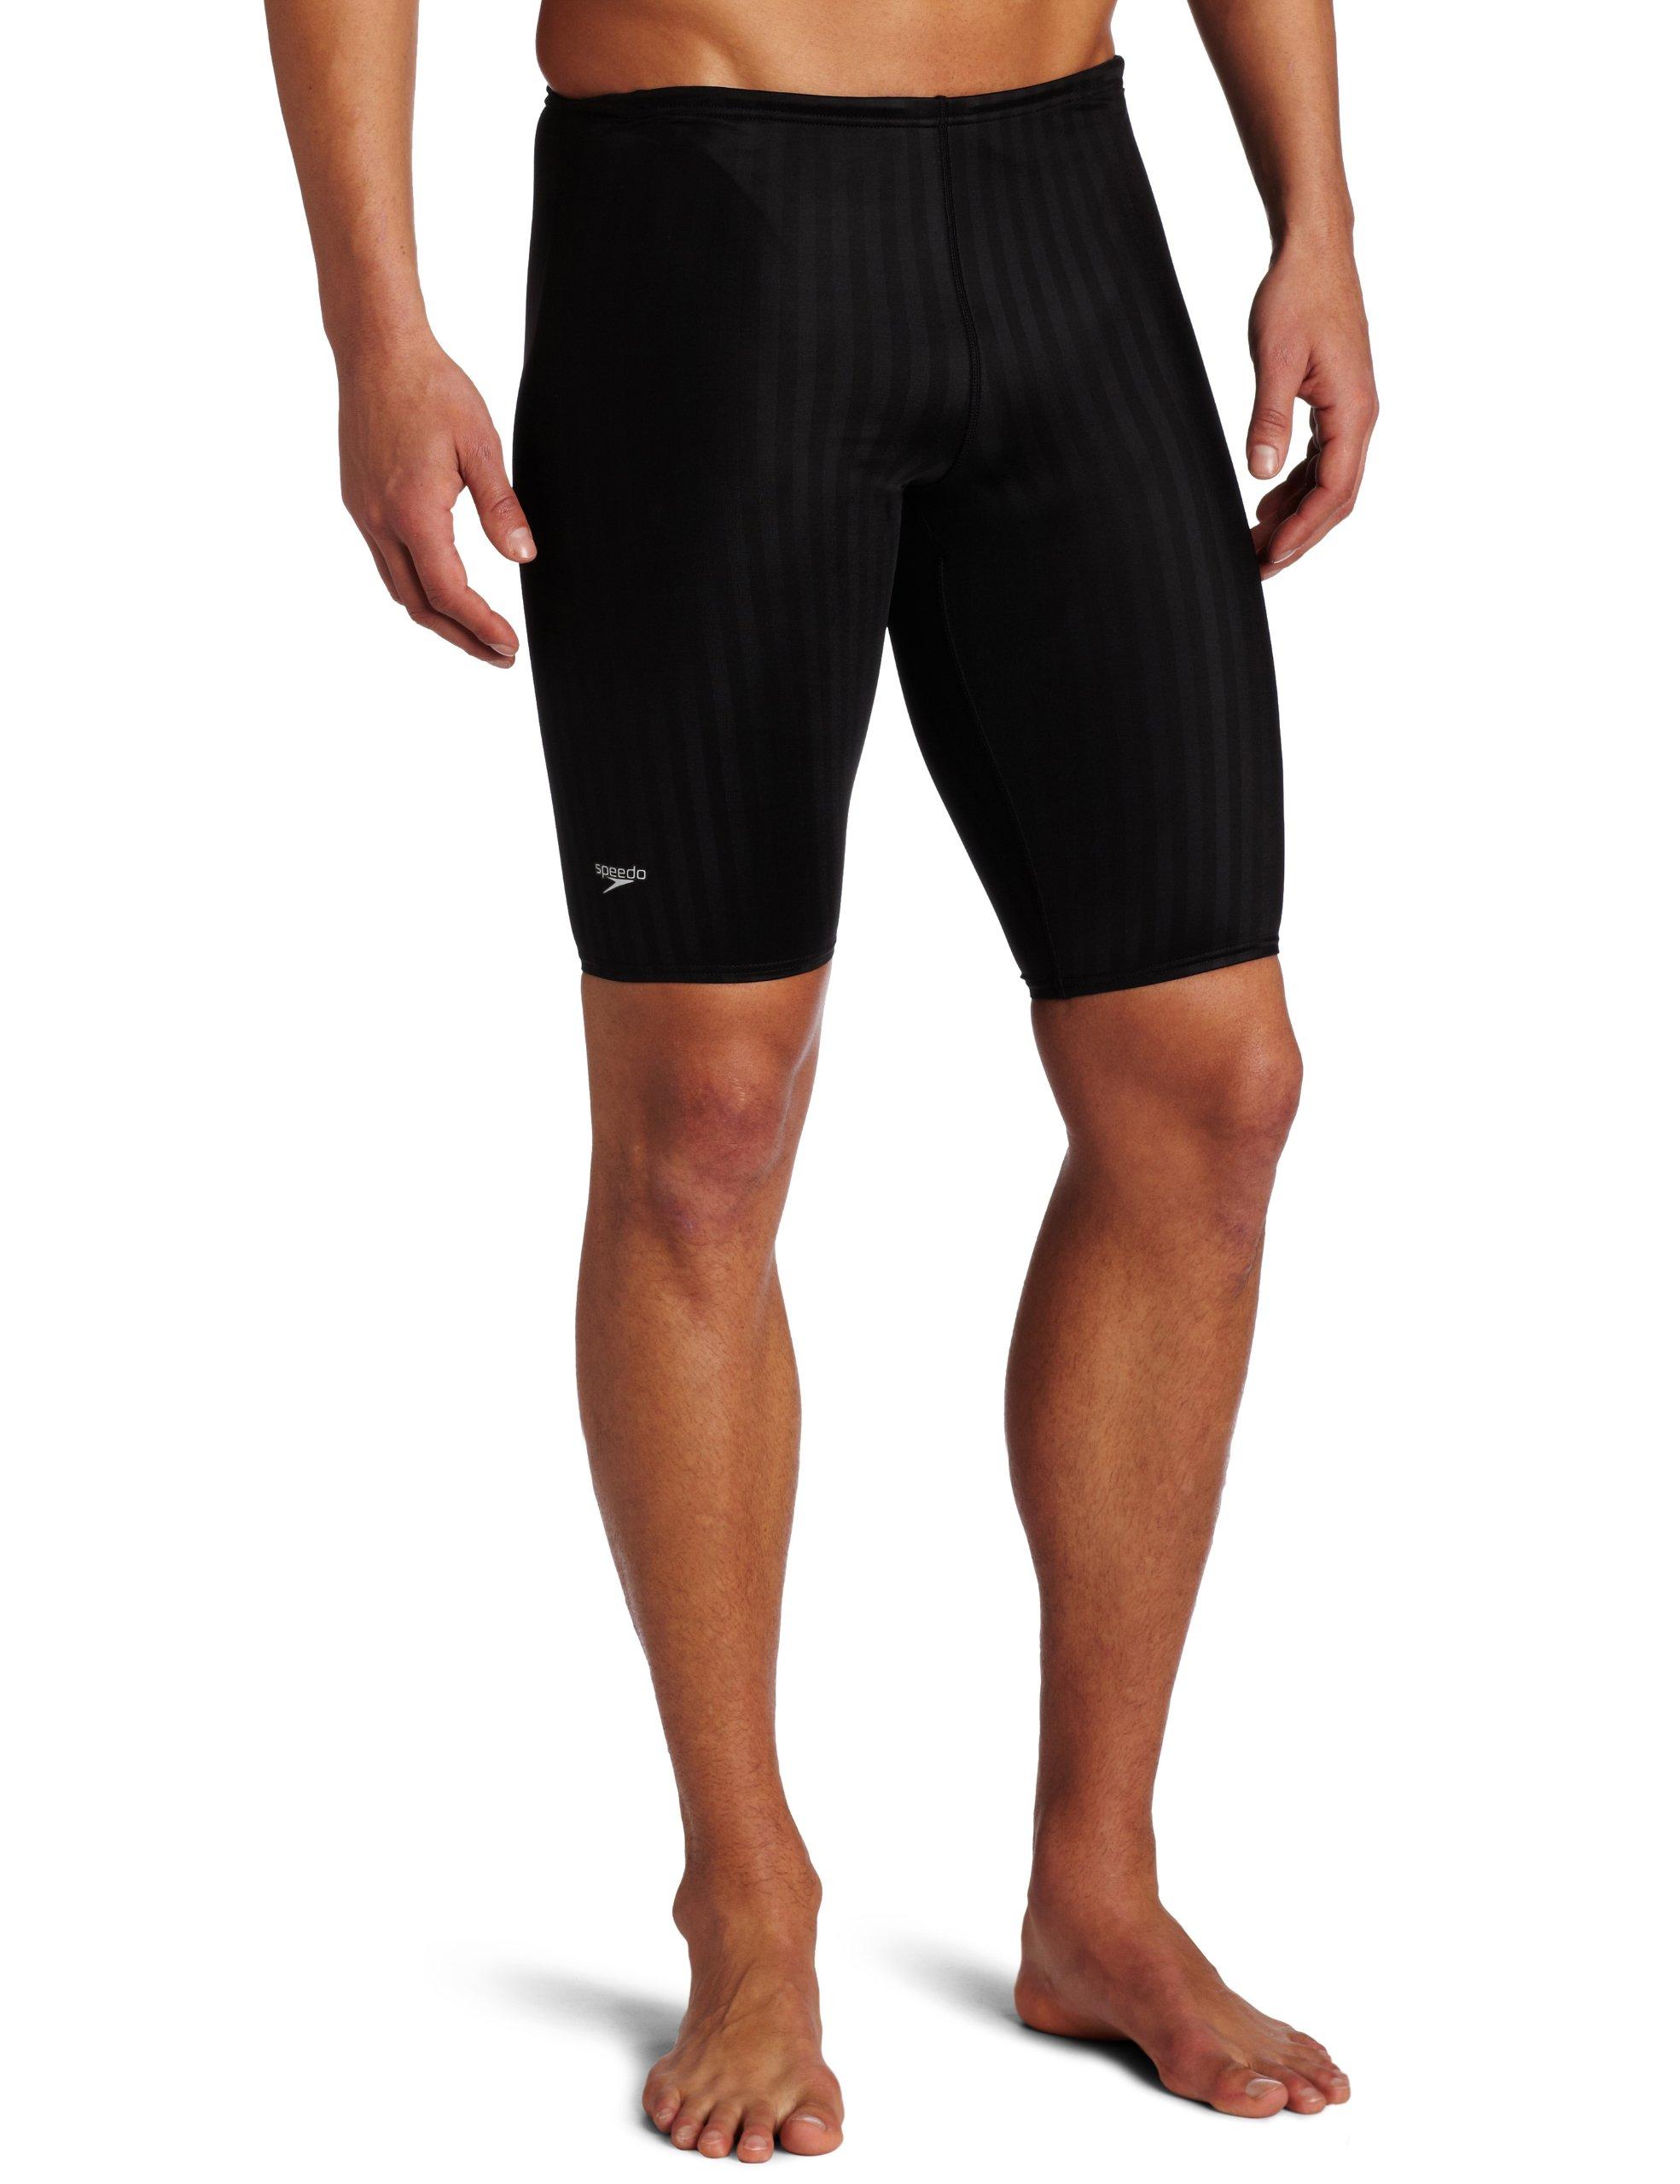 Speedo Male Jammer Swimsuit - Aquablade, 30, Speedo Black by Speedo